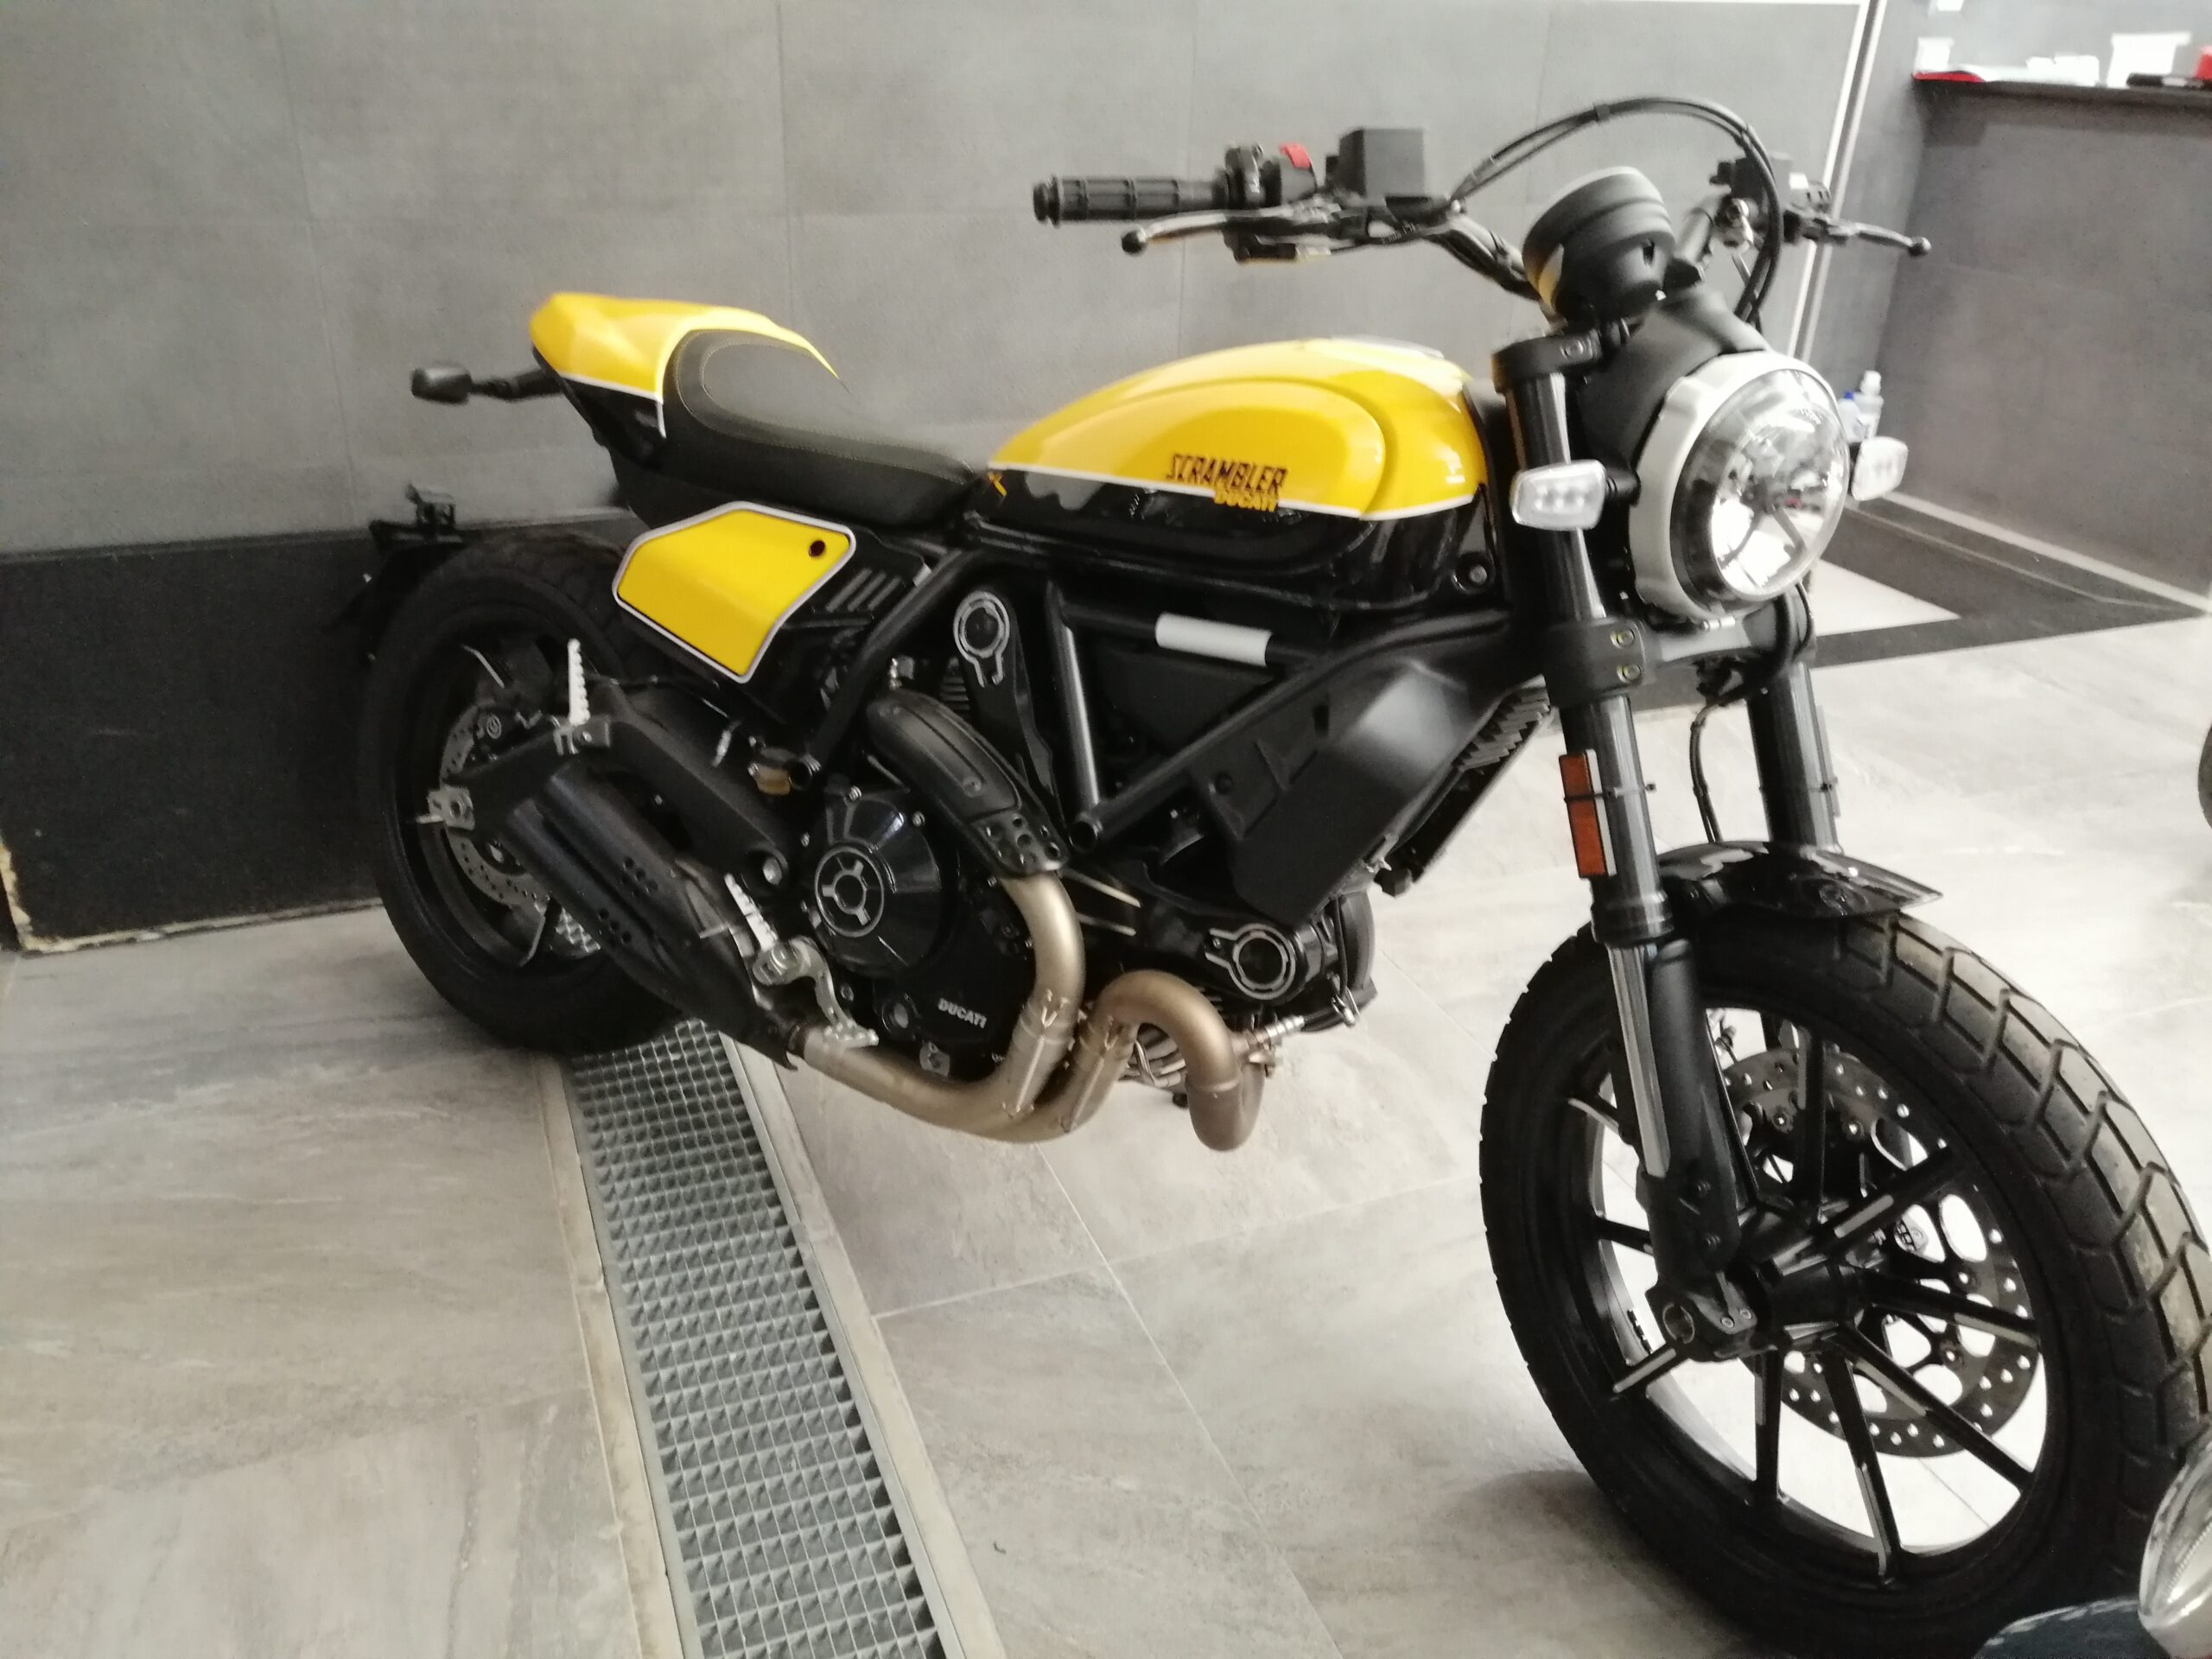 Ducati Scrambler 800 Full Trhottle Nuova 0 Km Xgamemoto